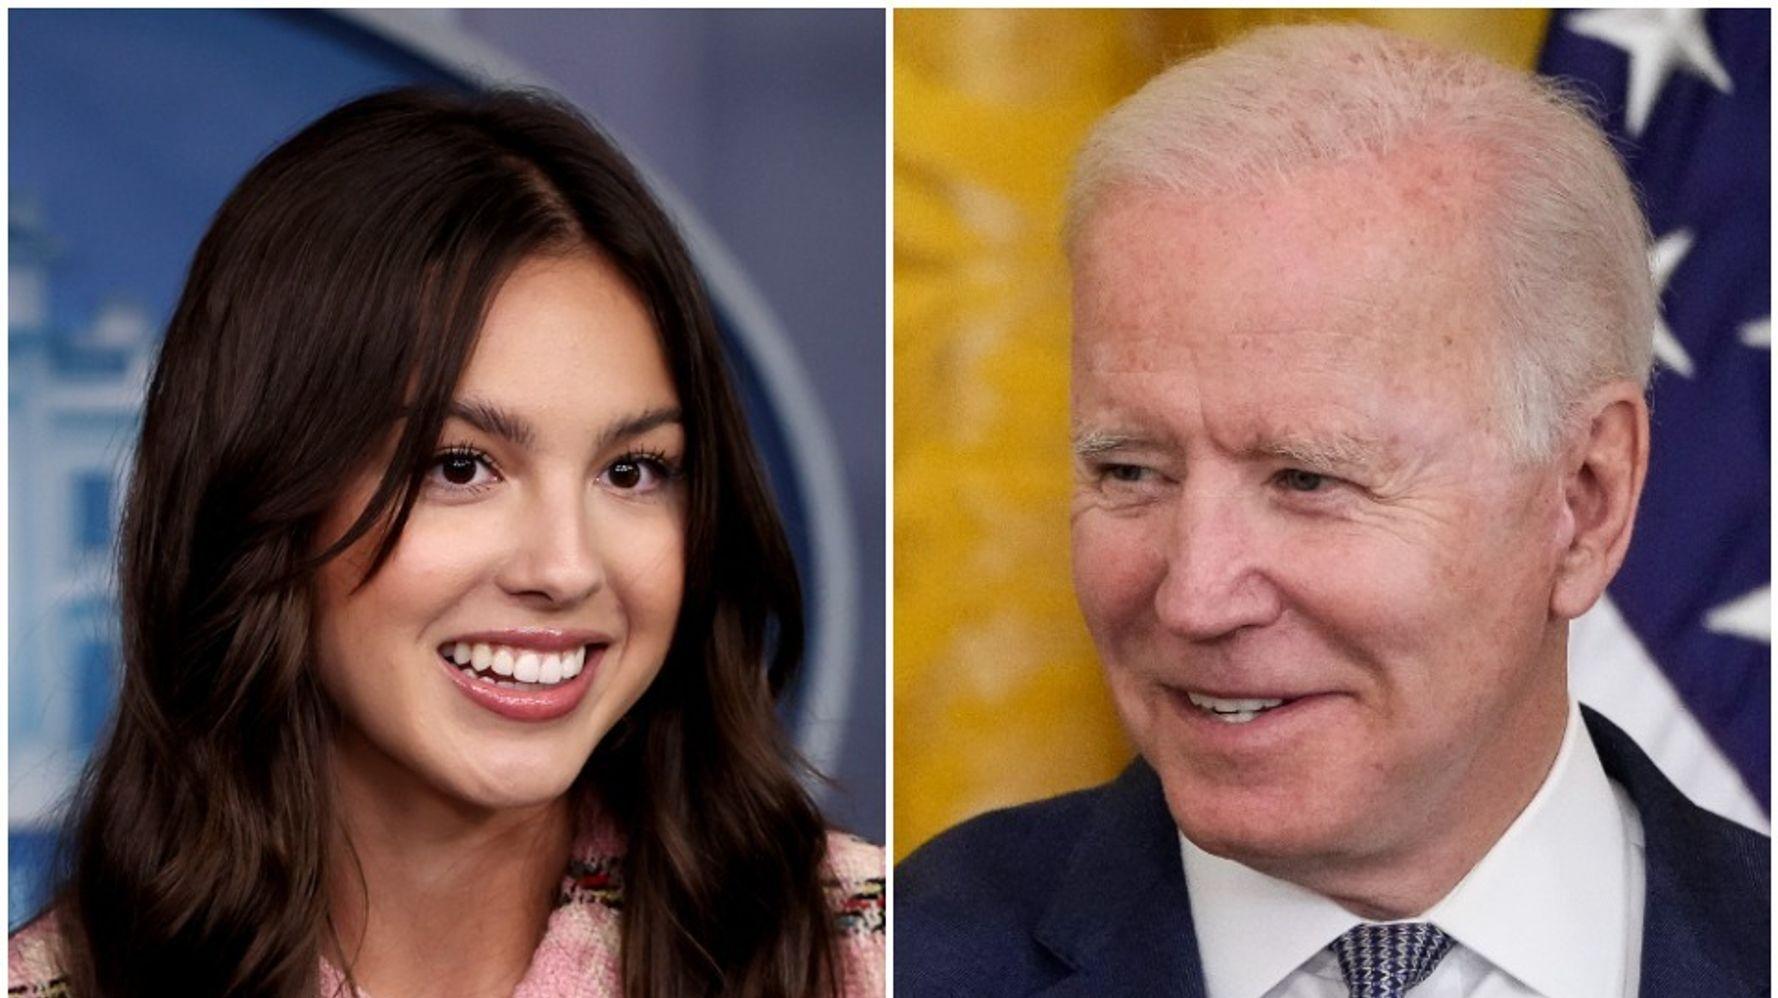 Olivia Rodrigo Shares 'Strange' Gift That Biden Gave Her During White House Visit